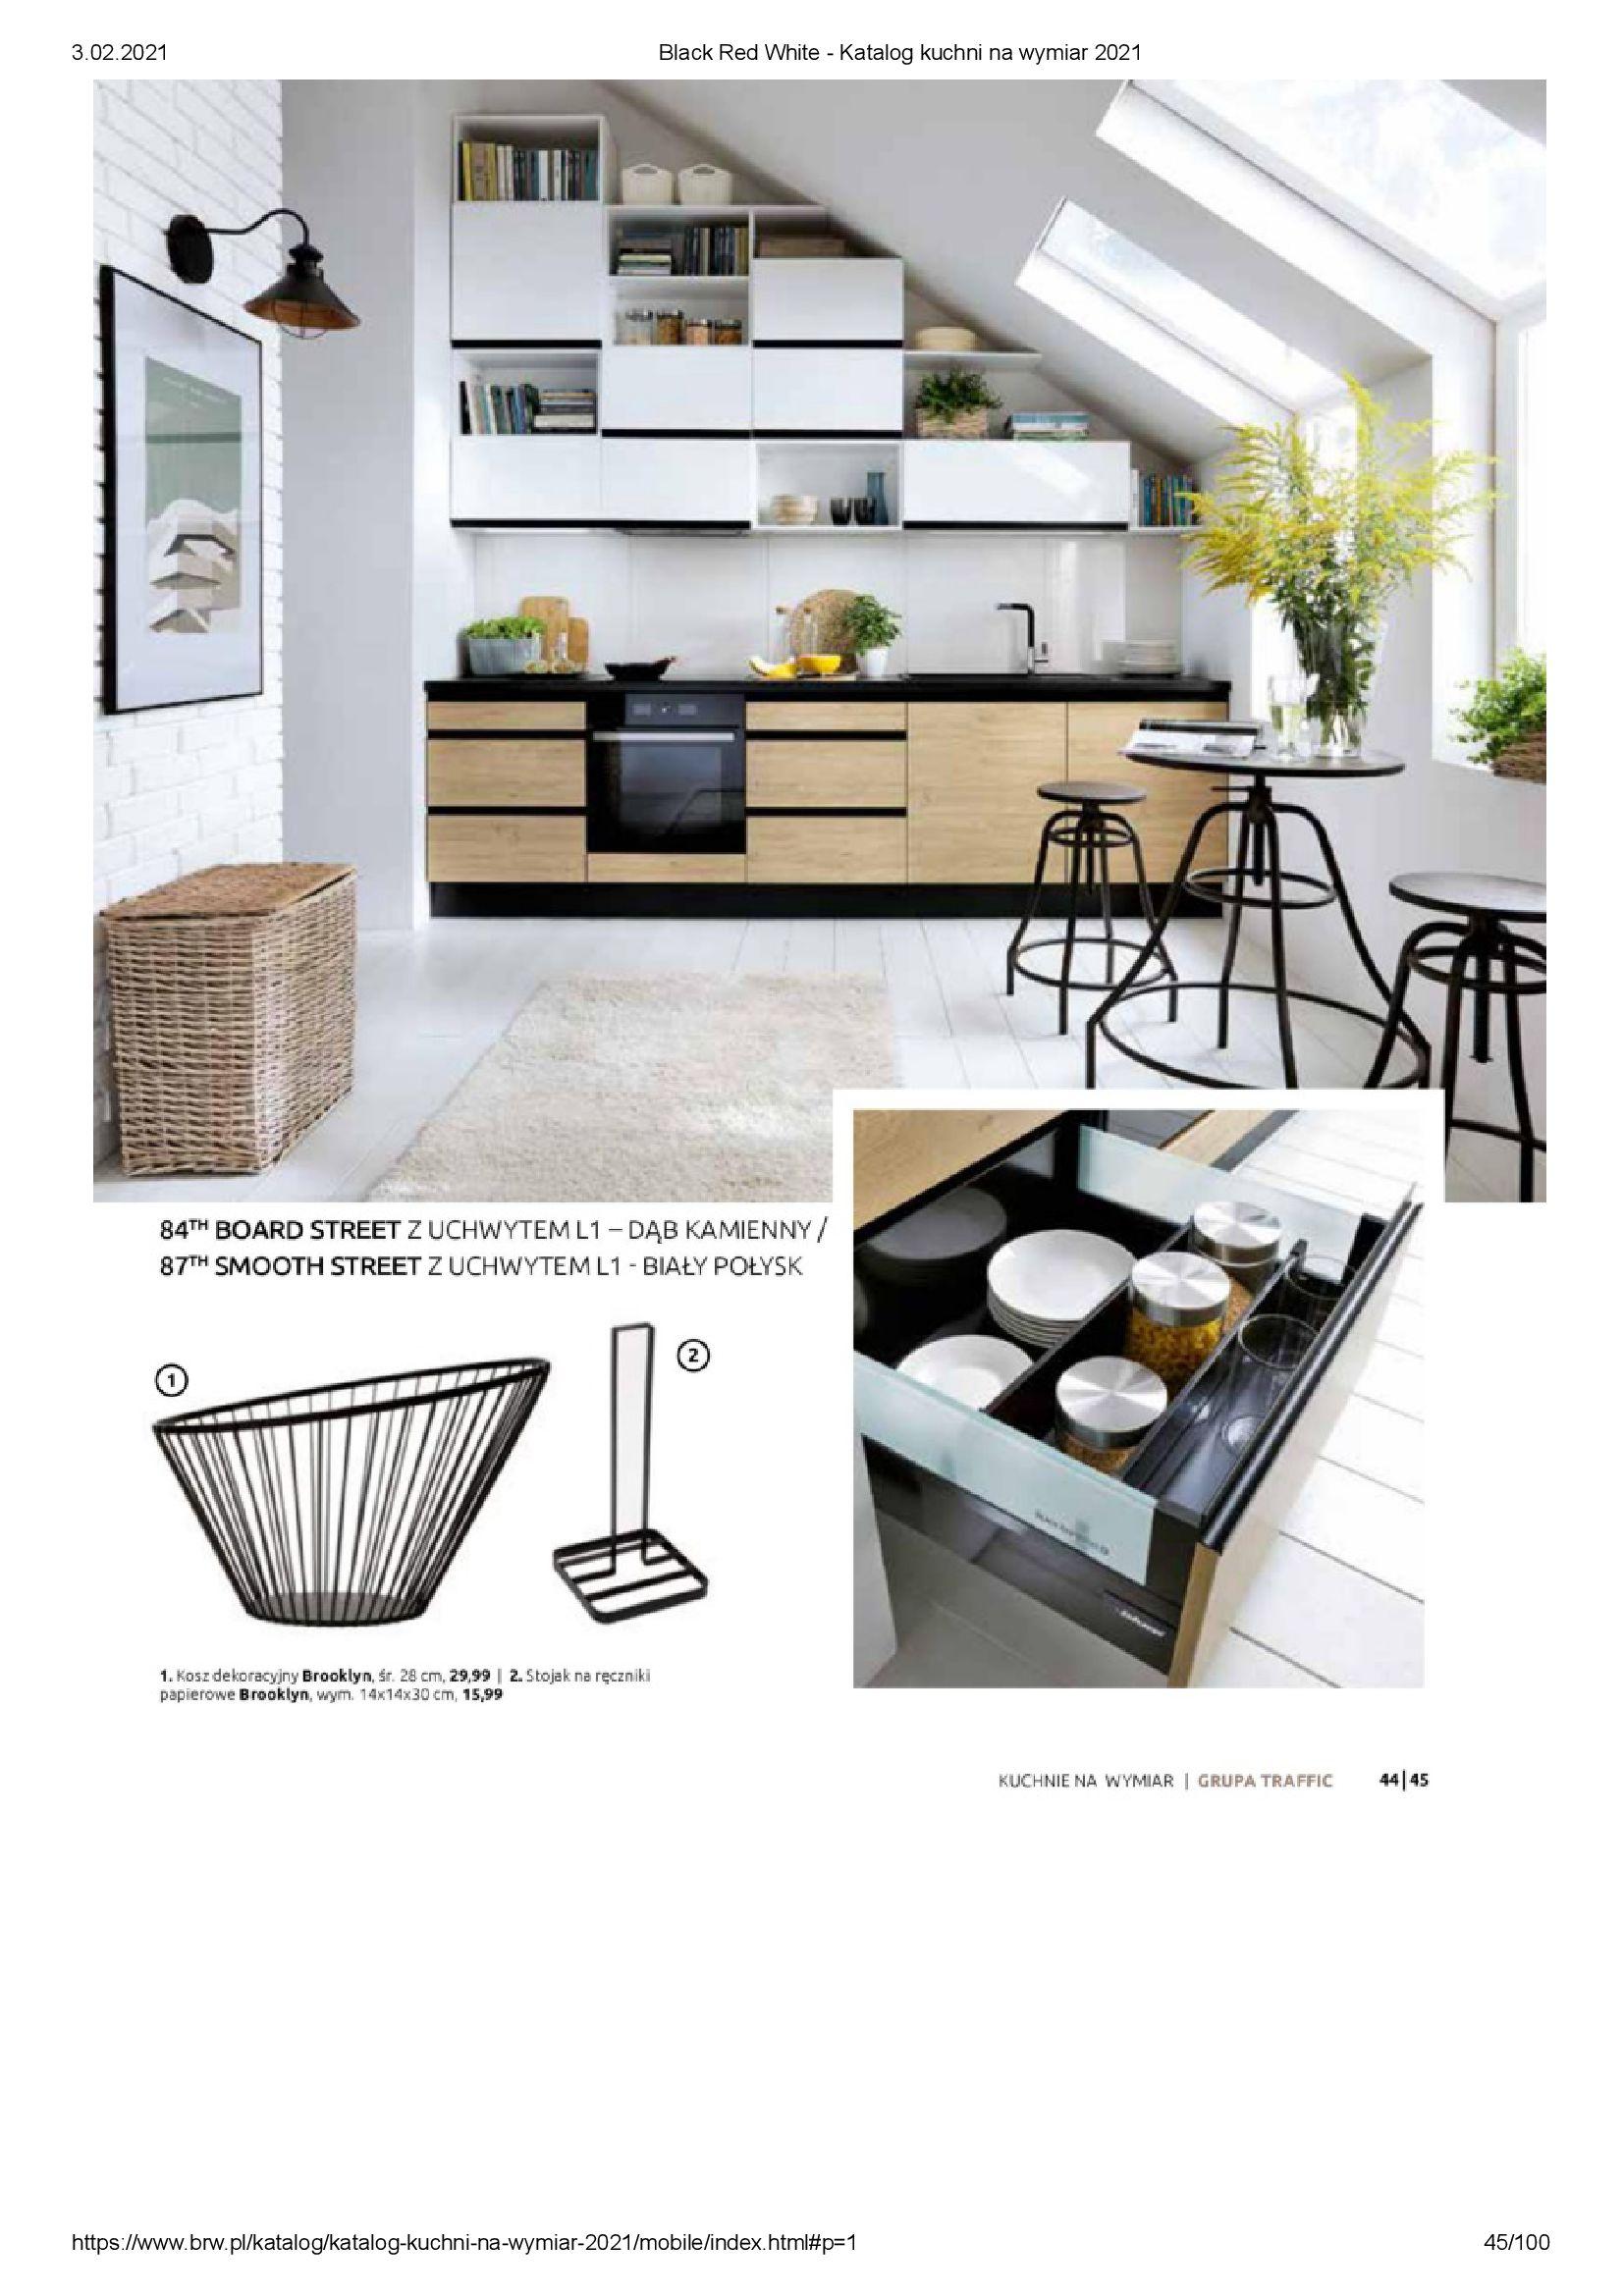 Gazetka Black Red White: Katalog - Kuchnie na wymiar Senso Kitchens 2021 2021-01-01 page-45